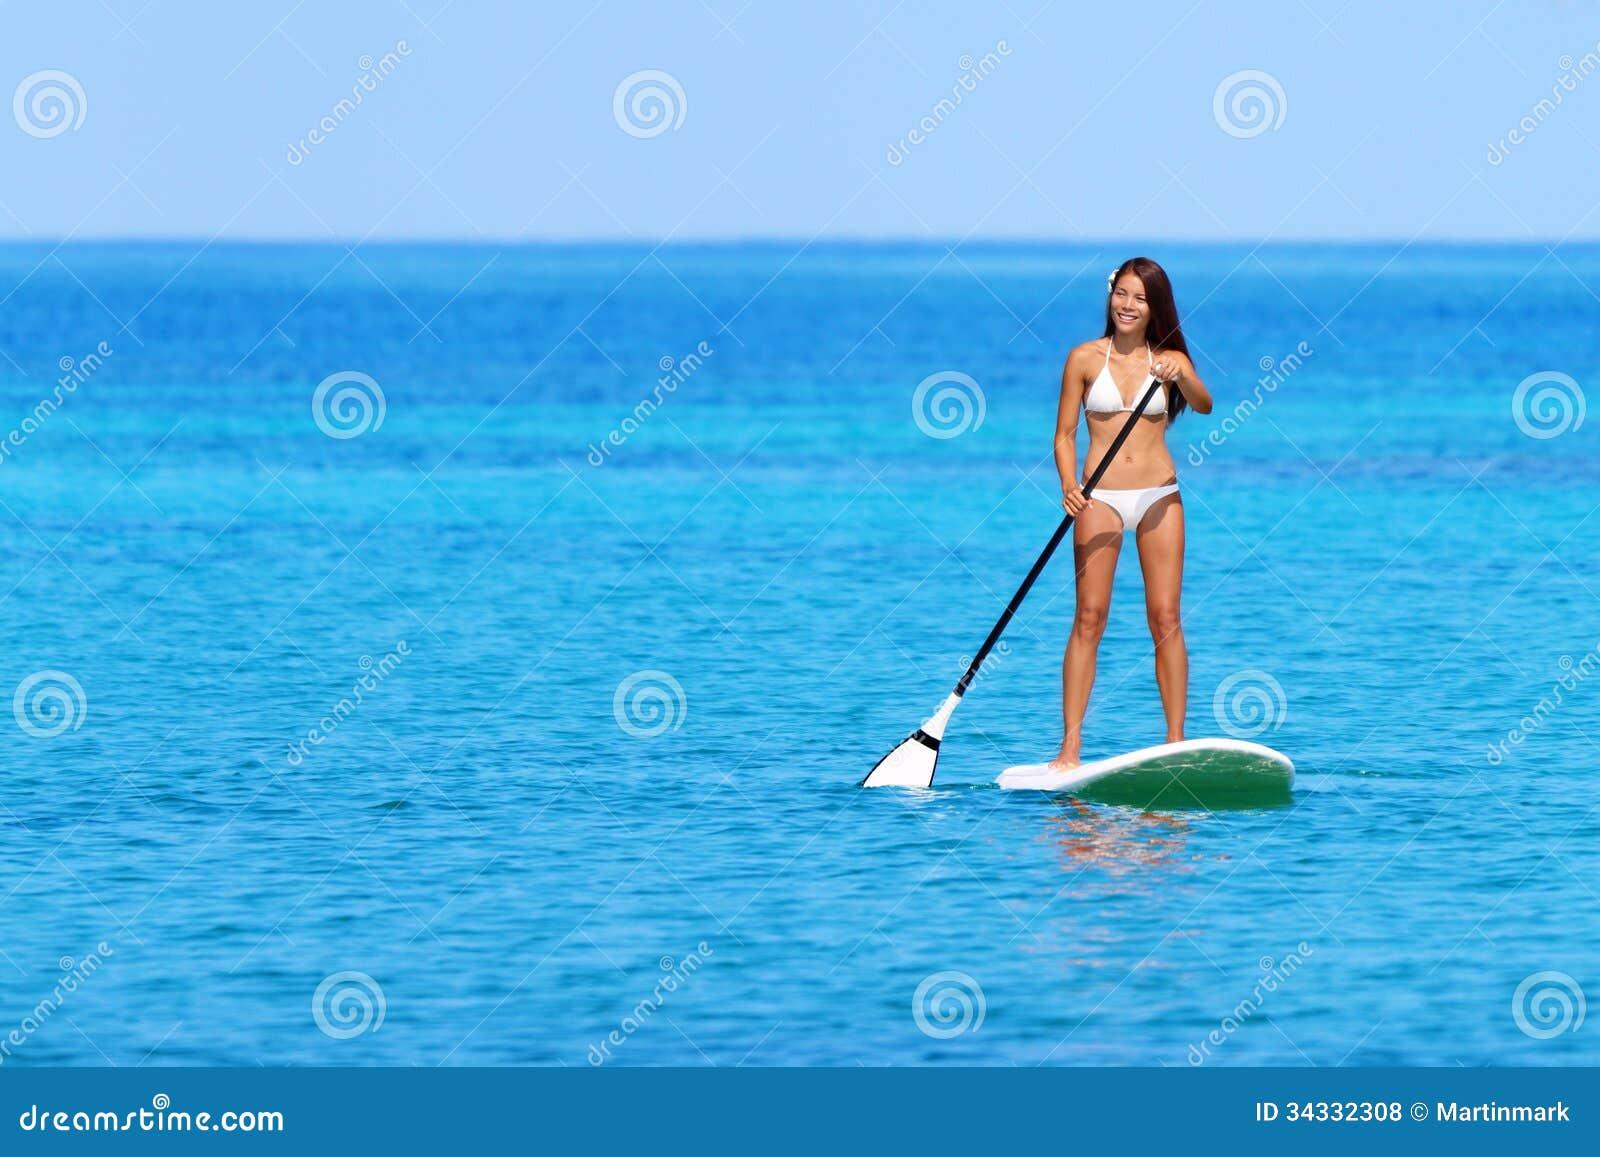 Stoi up paddle deski kobiety paddleboarding